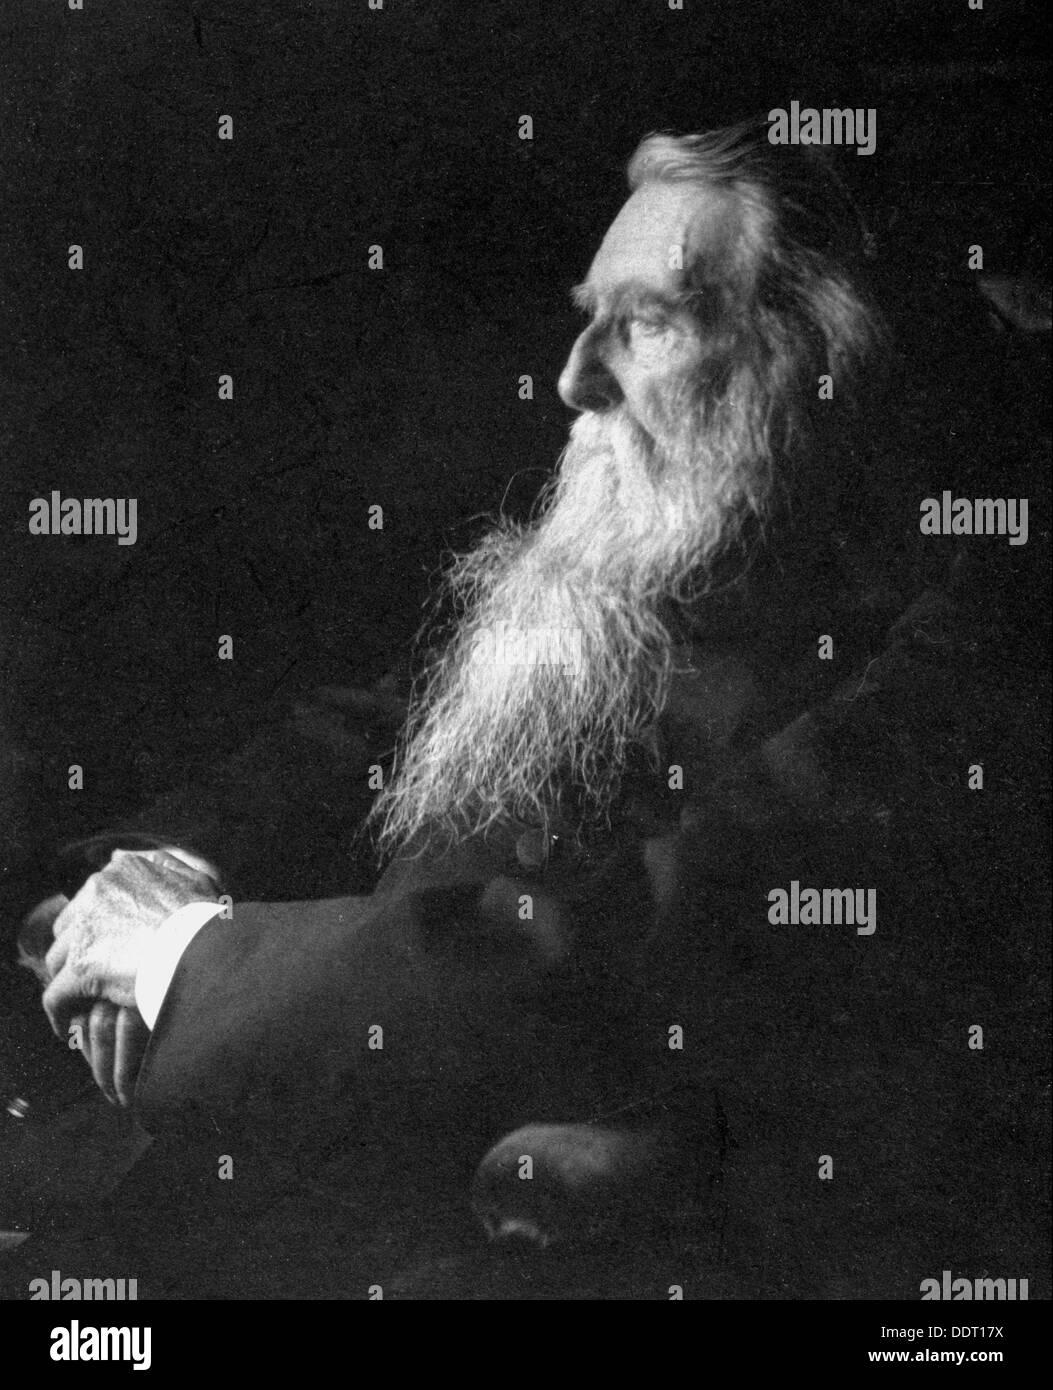 John Ruskin, English artist, poet and critic, c1897. Artist: Emil Otto Hoppe Stock Photo